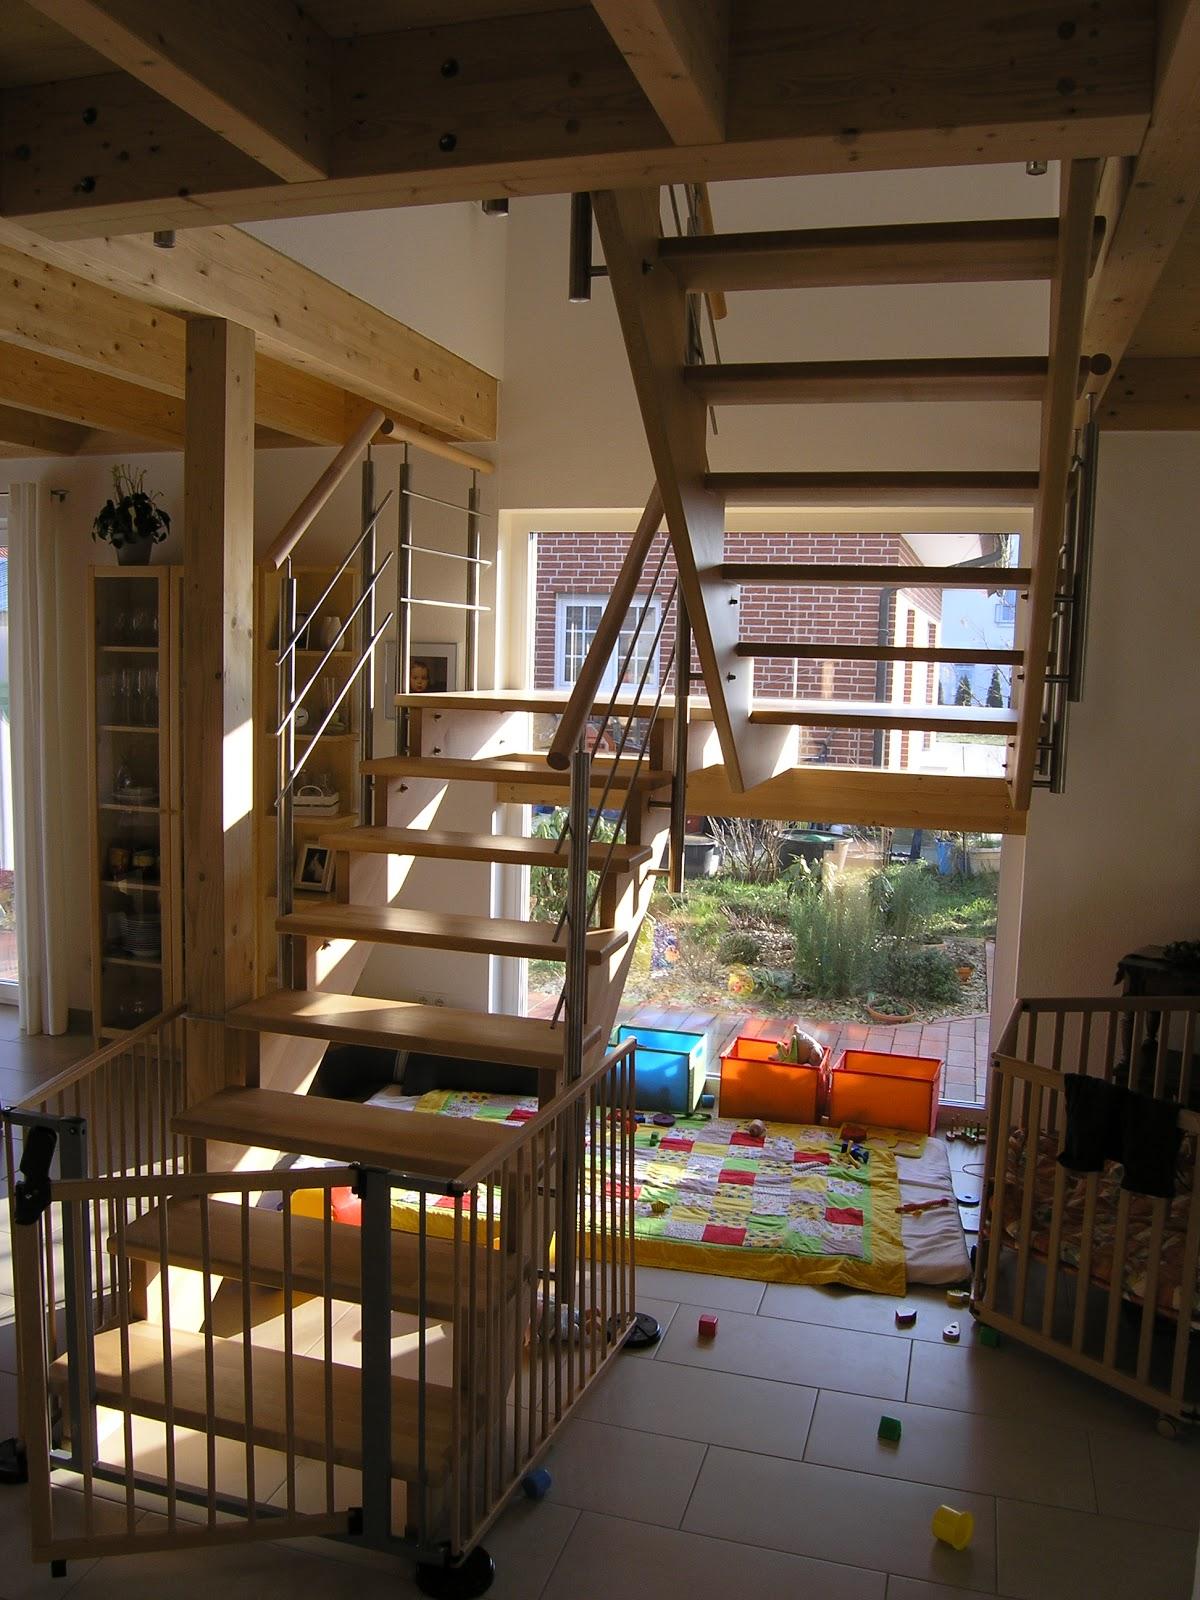 offene treppe sichern hund wohn design. Black Bedroom Furniture Sets. Home Design Ideas